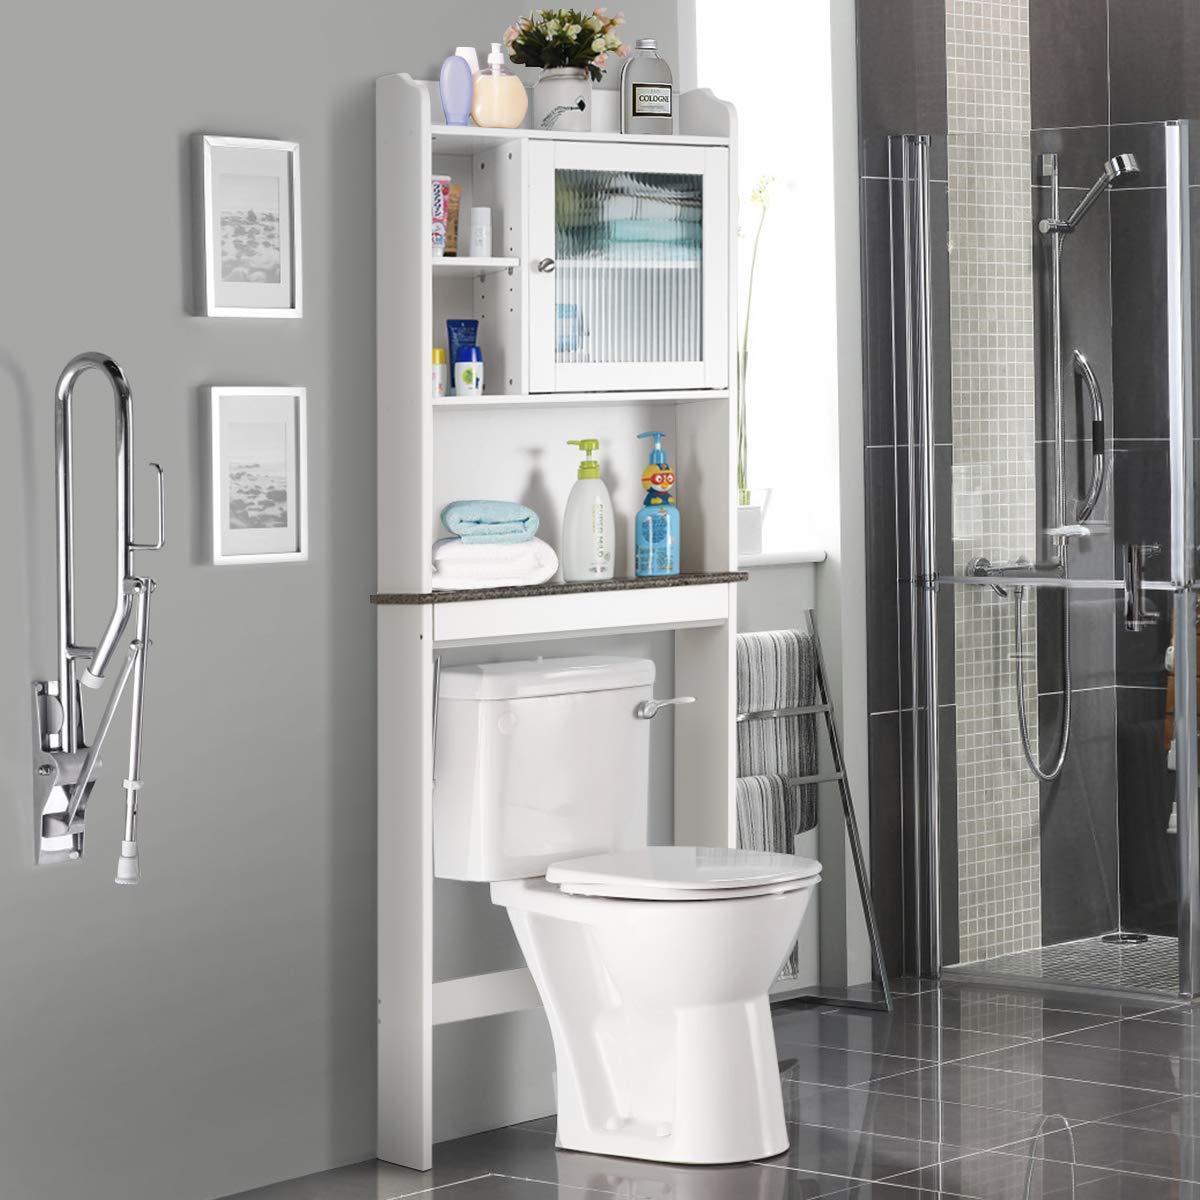 Giantex Over-The-Toilet Space Saver Collette Bathroom Spacesaver W/Storage Rack Cabinet Bathroom Organizer (68.1'' H) by Giantex